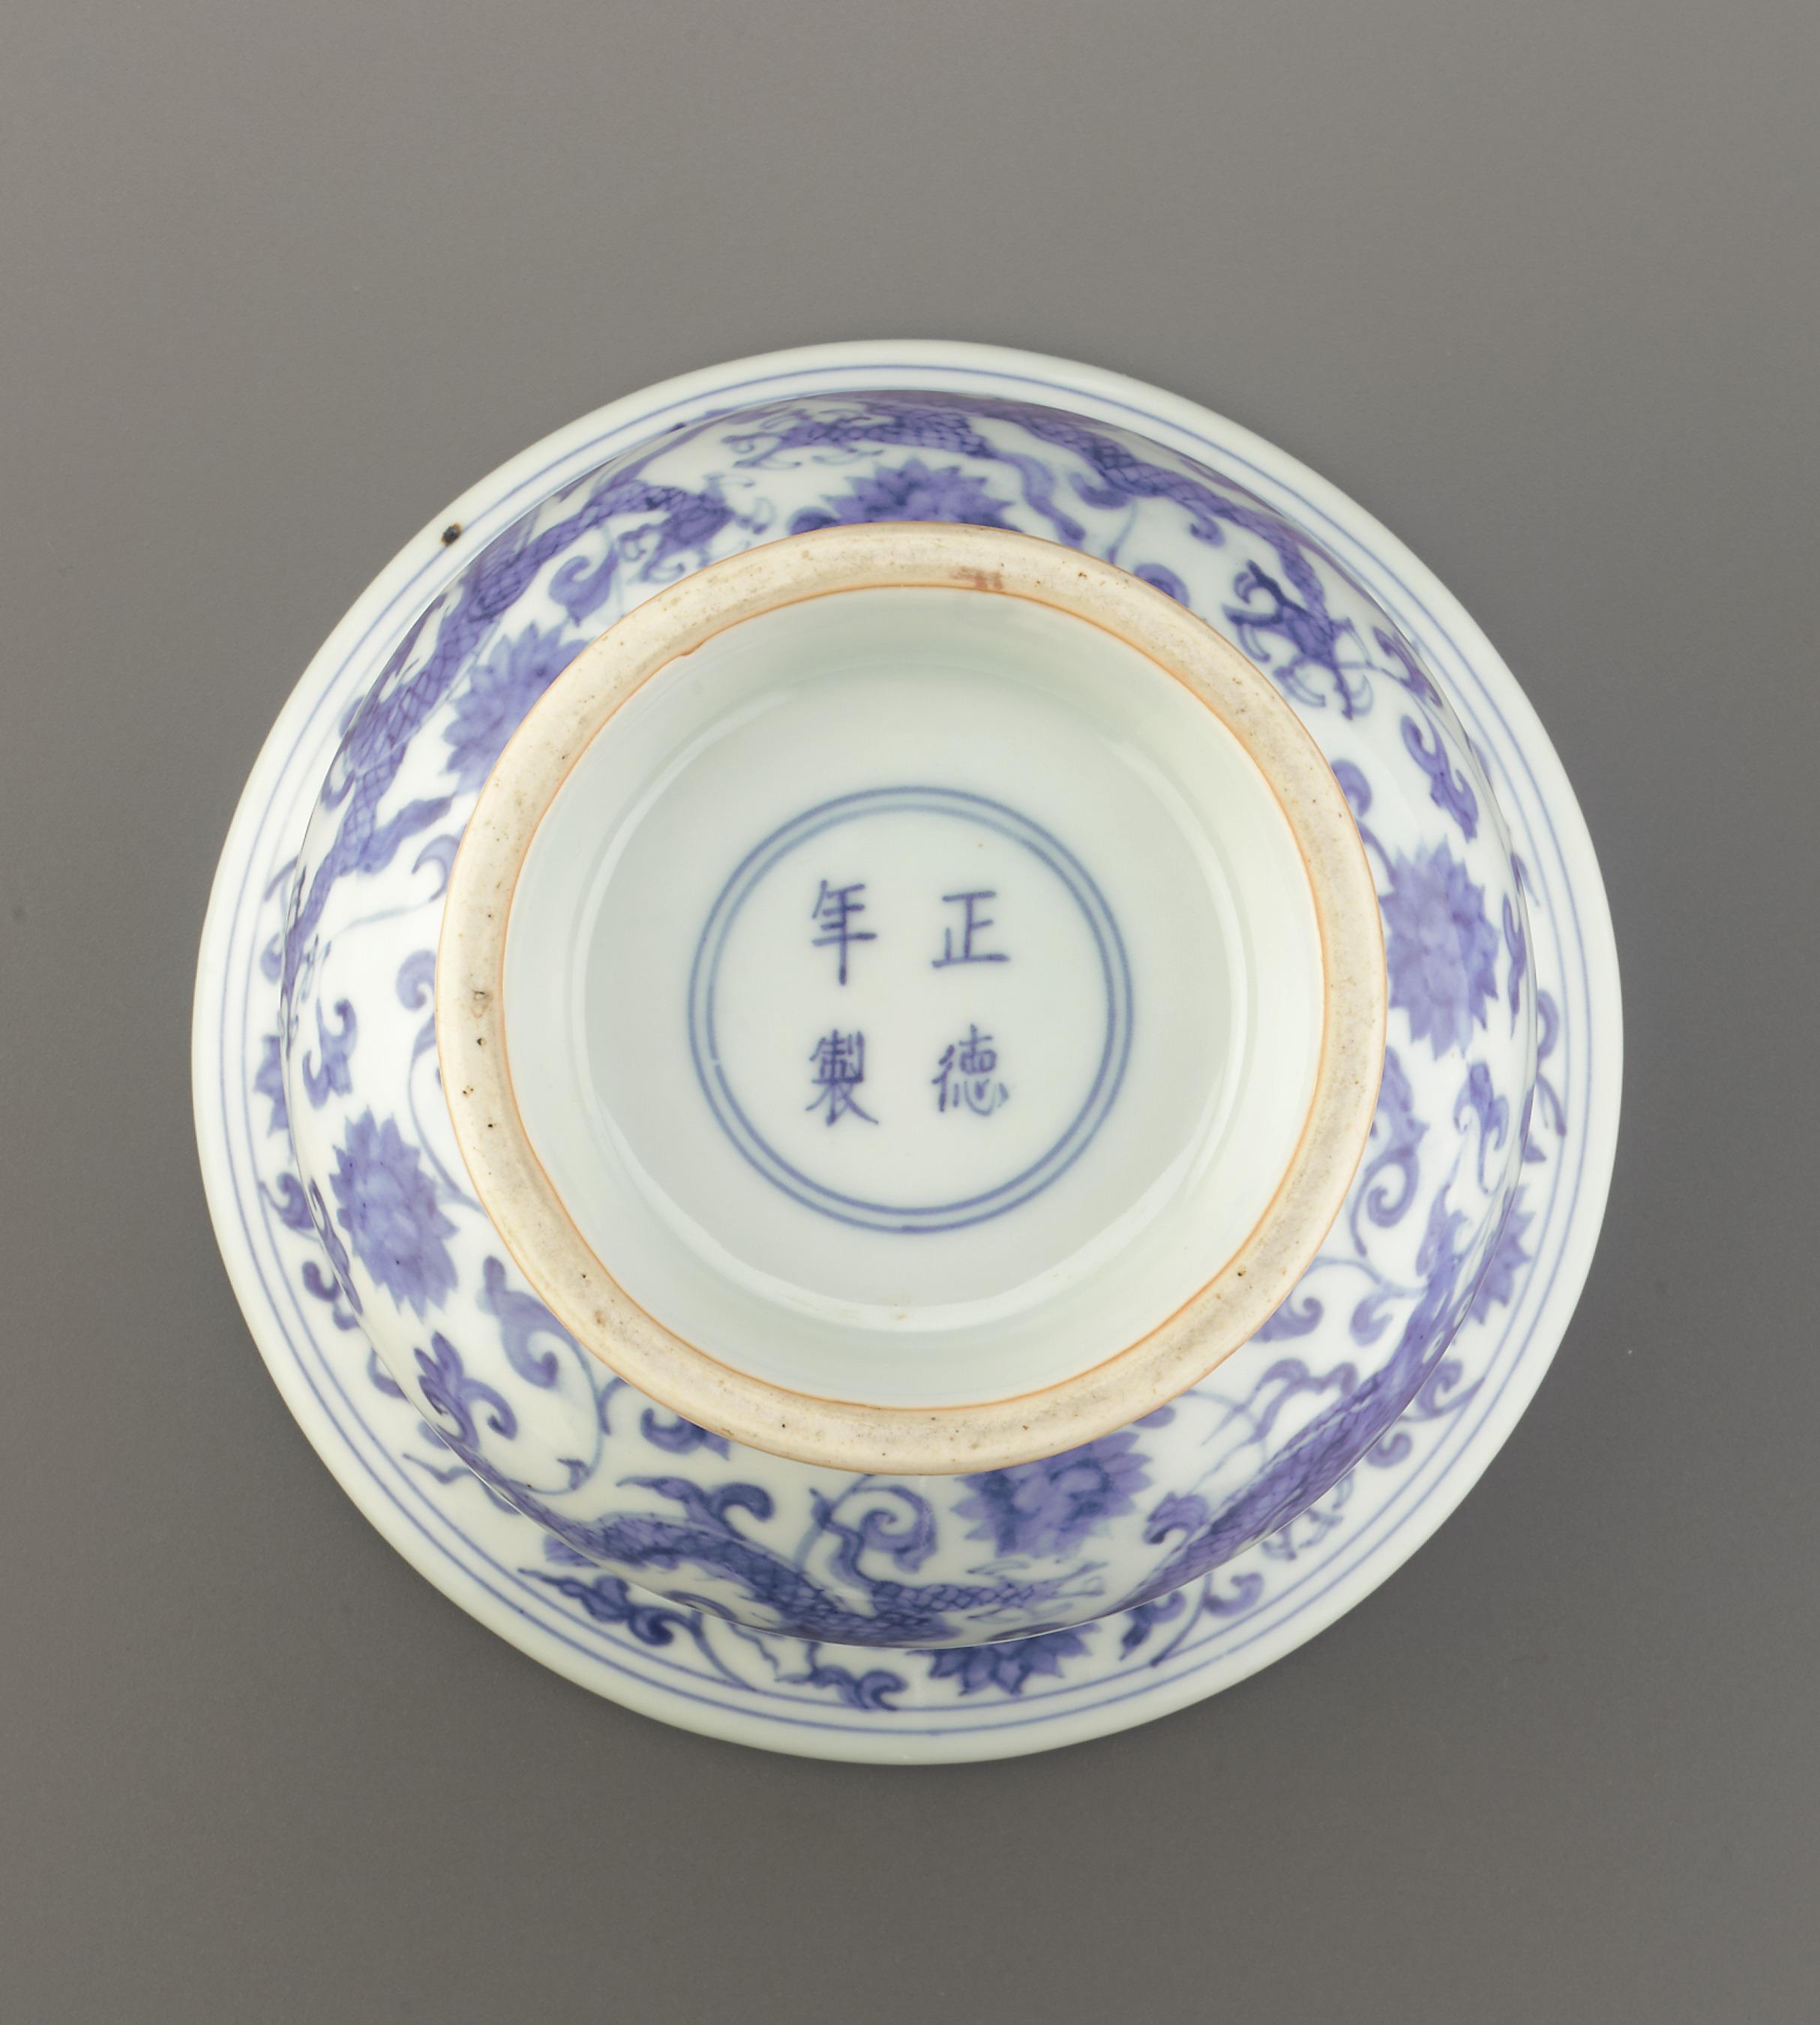 Zhengde mark and period alainruong blue and white slops jar zhadou zhengde mark and period 1506 1521 ming dynasty 1368 1644 jingdezhen jiangxi province reviewsmspy